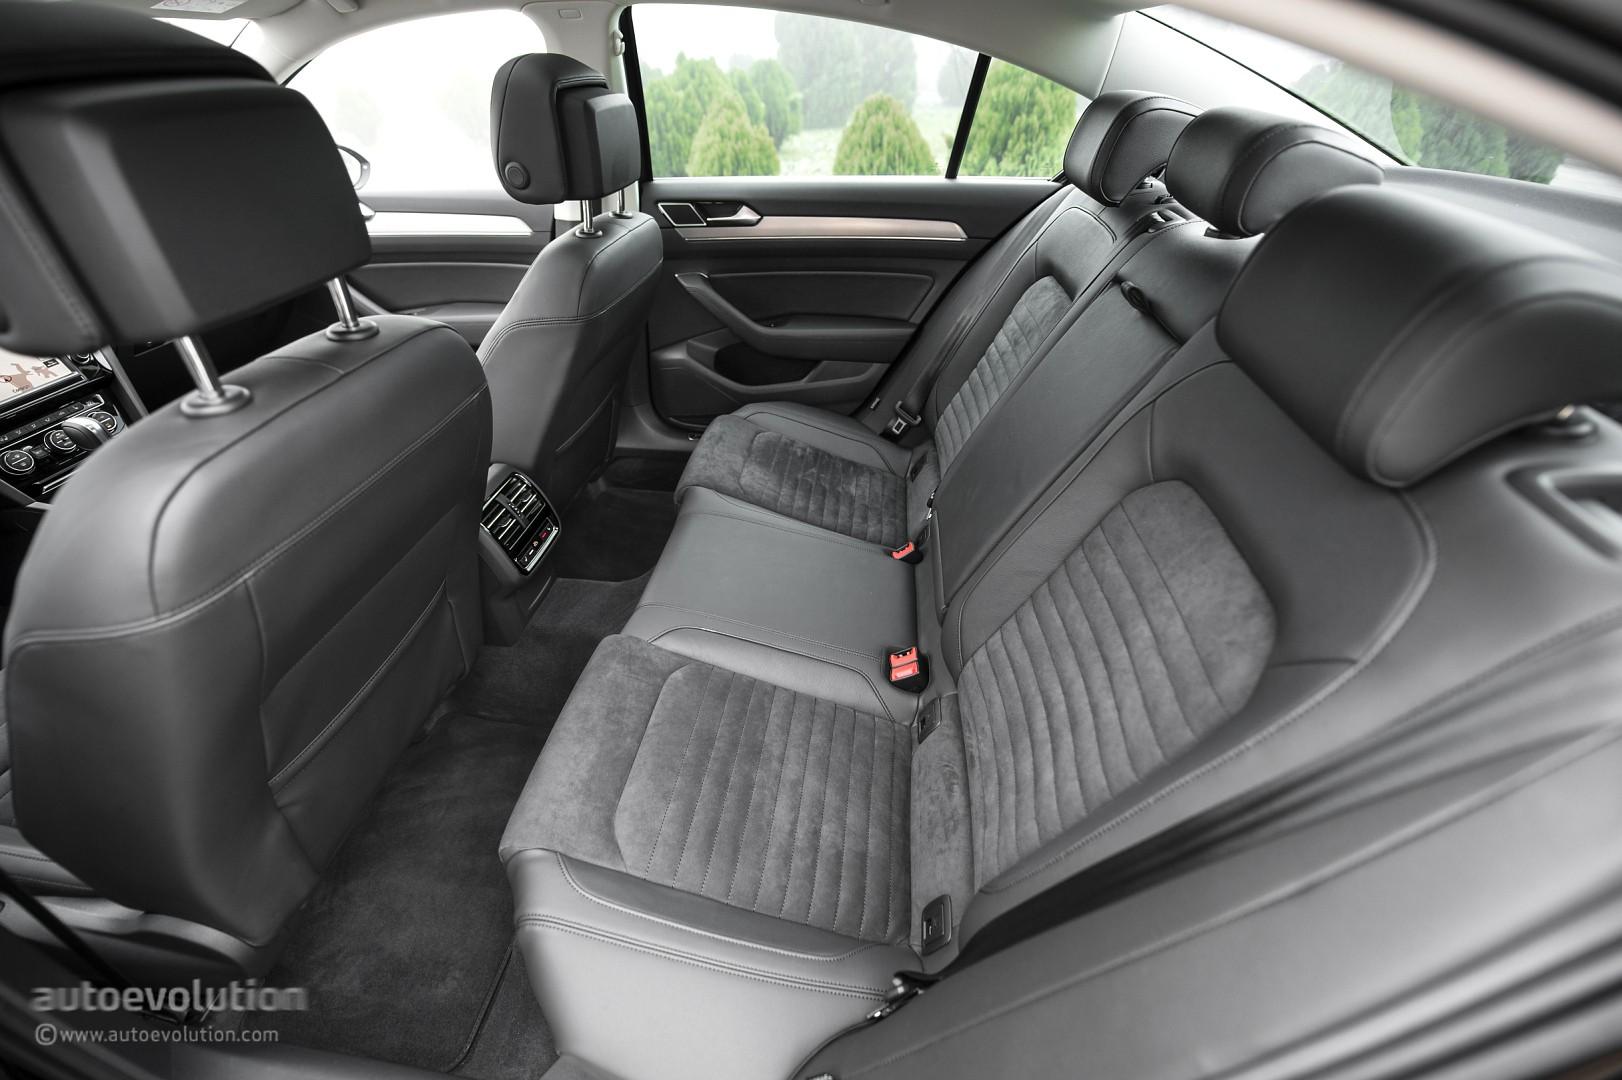 Reviews Car Seats Toddlers